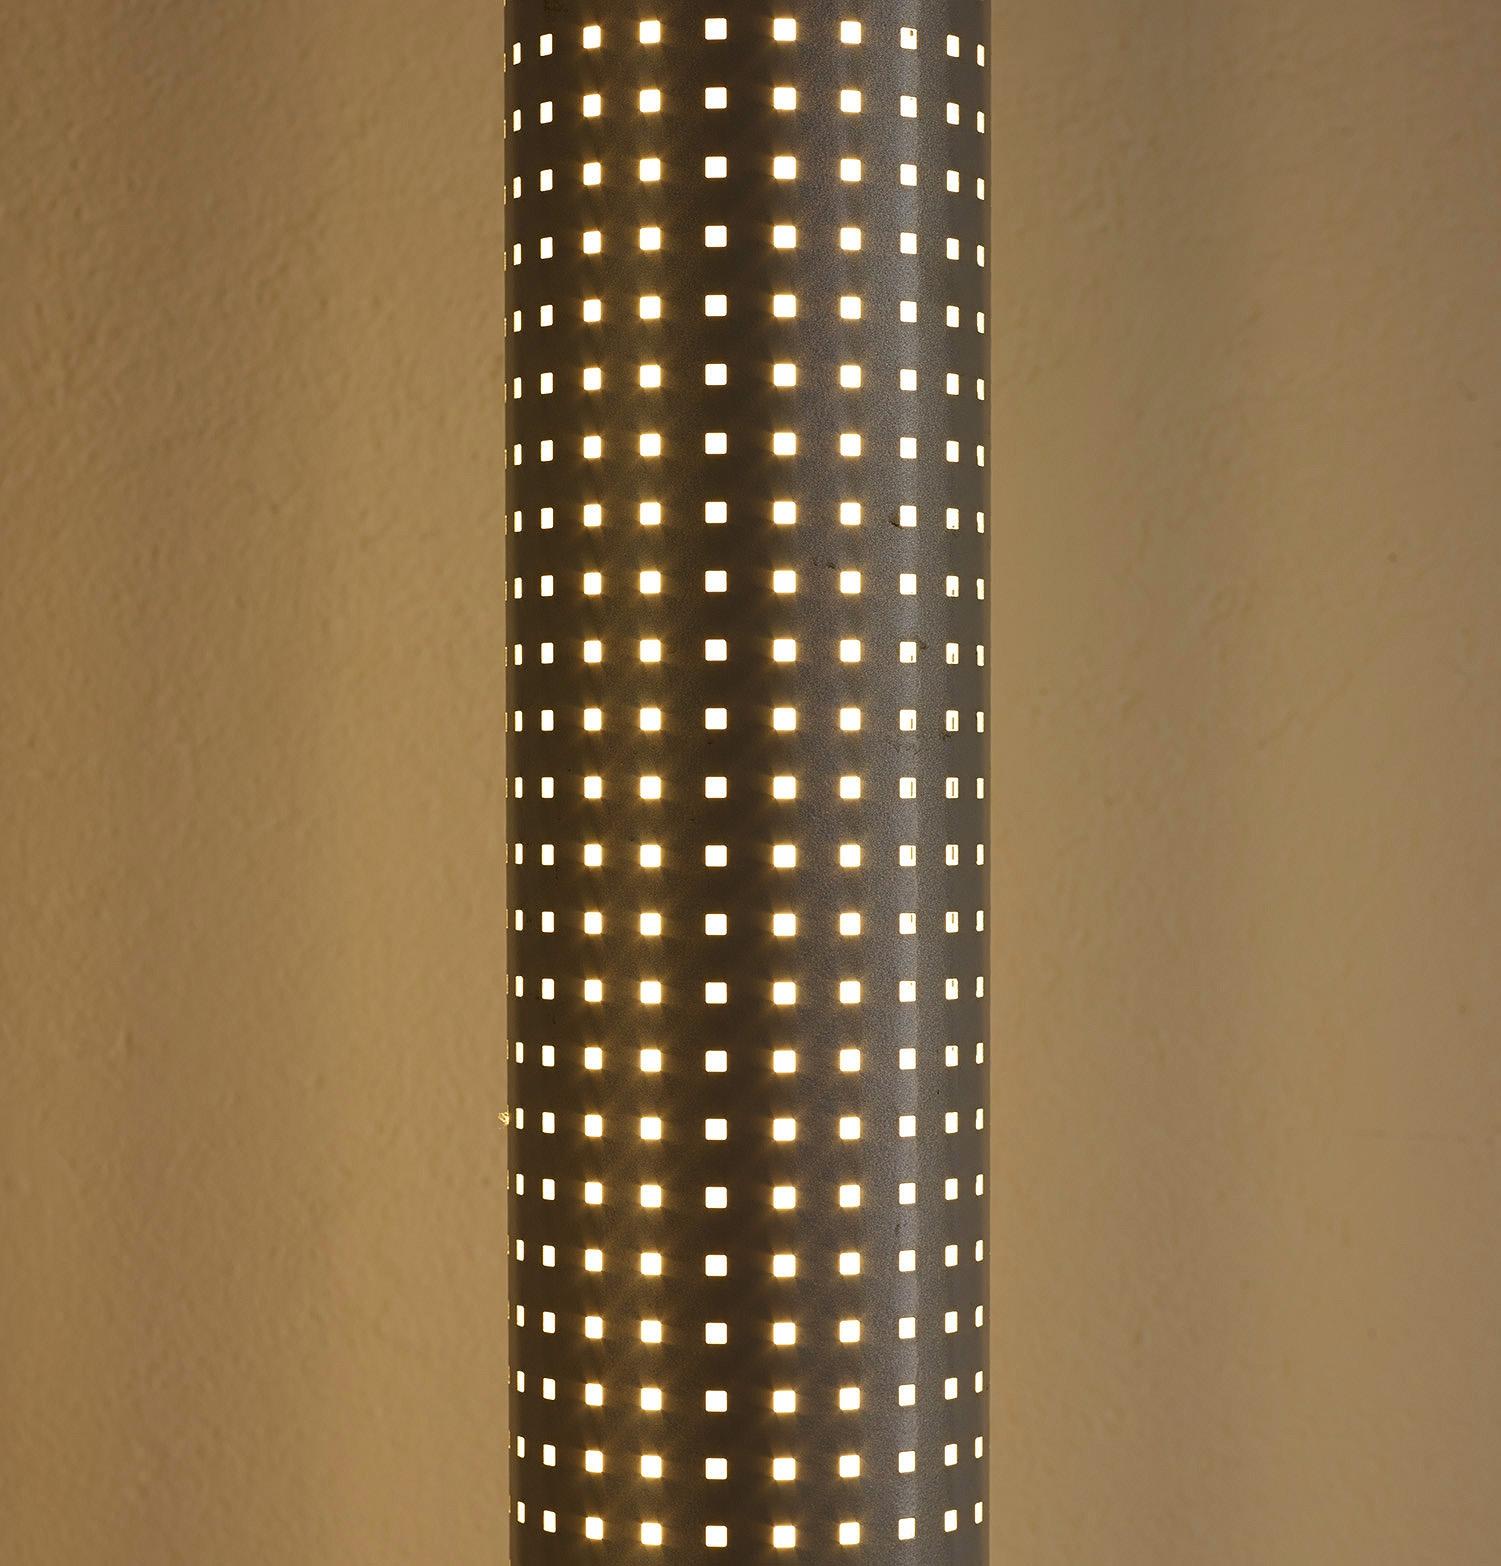 floor-lamp-chicago-tribune-by-matteo-thun-and-andrea-lera-image-05